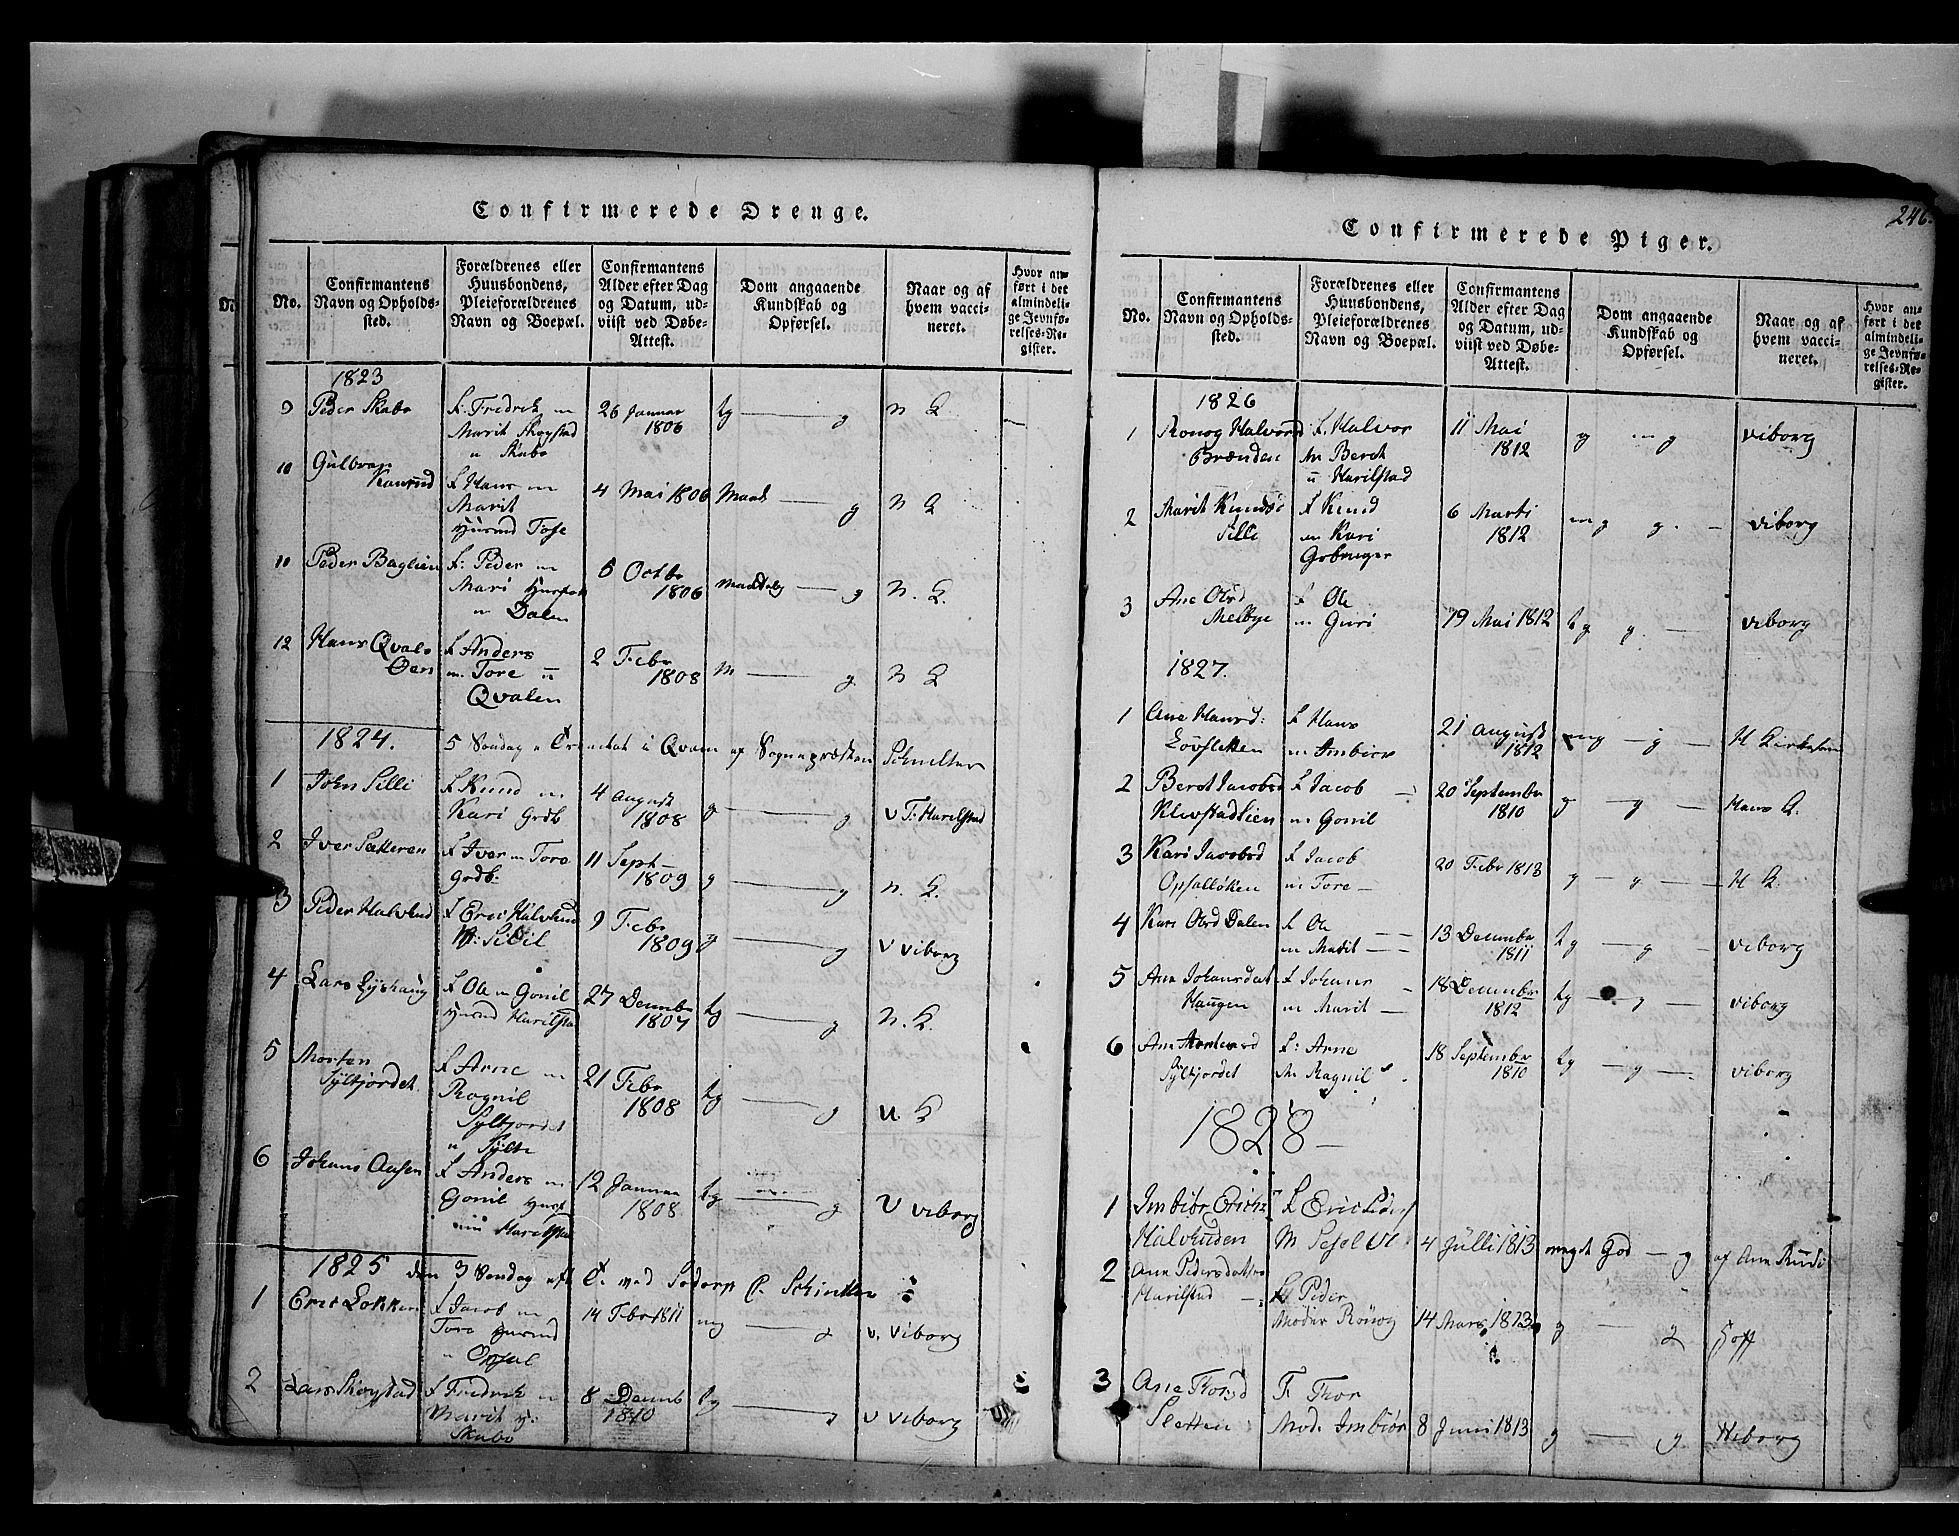 SAH, Fron prestekontor, H/Ha/Hab/L0003: Klokkerbok nr. 3, 1816-1850, s. 246